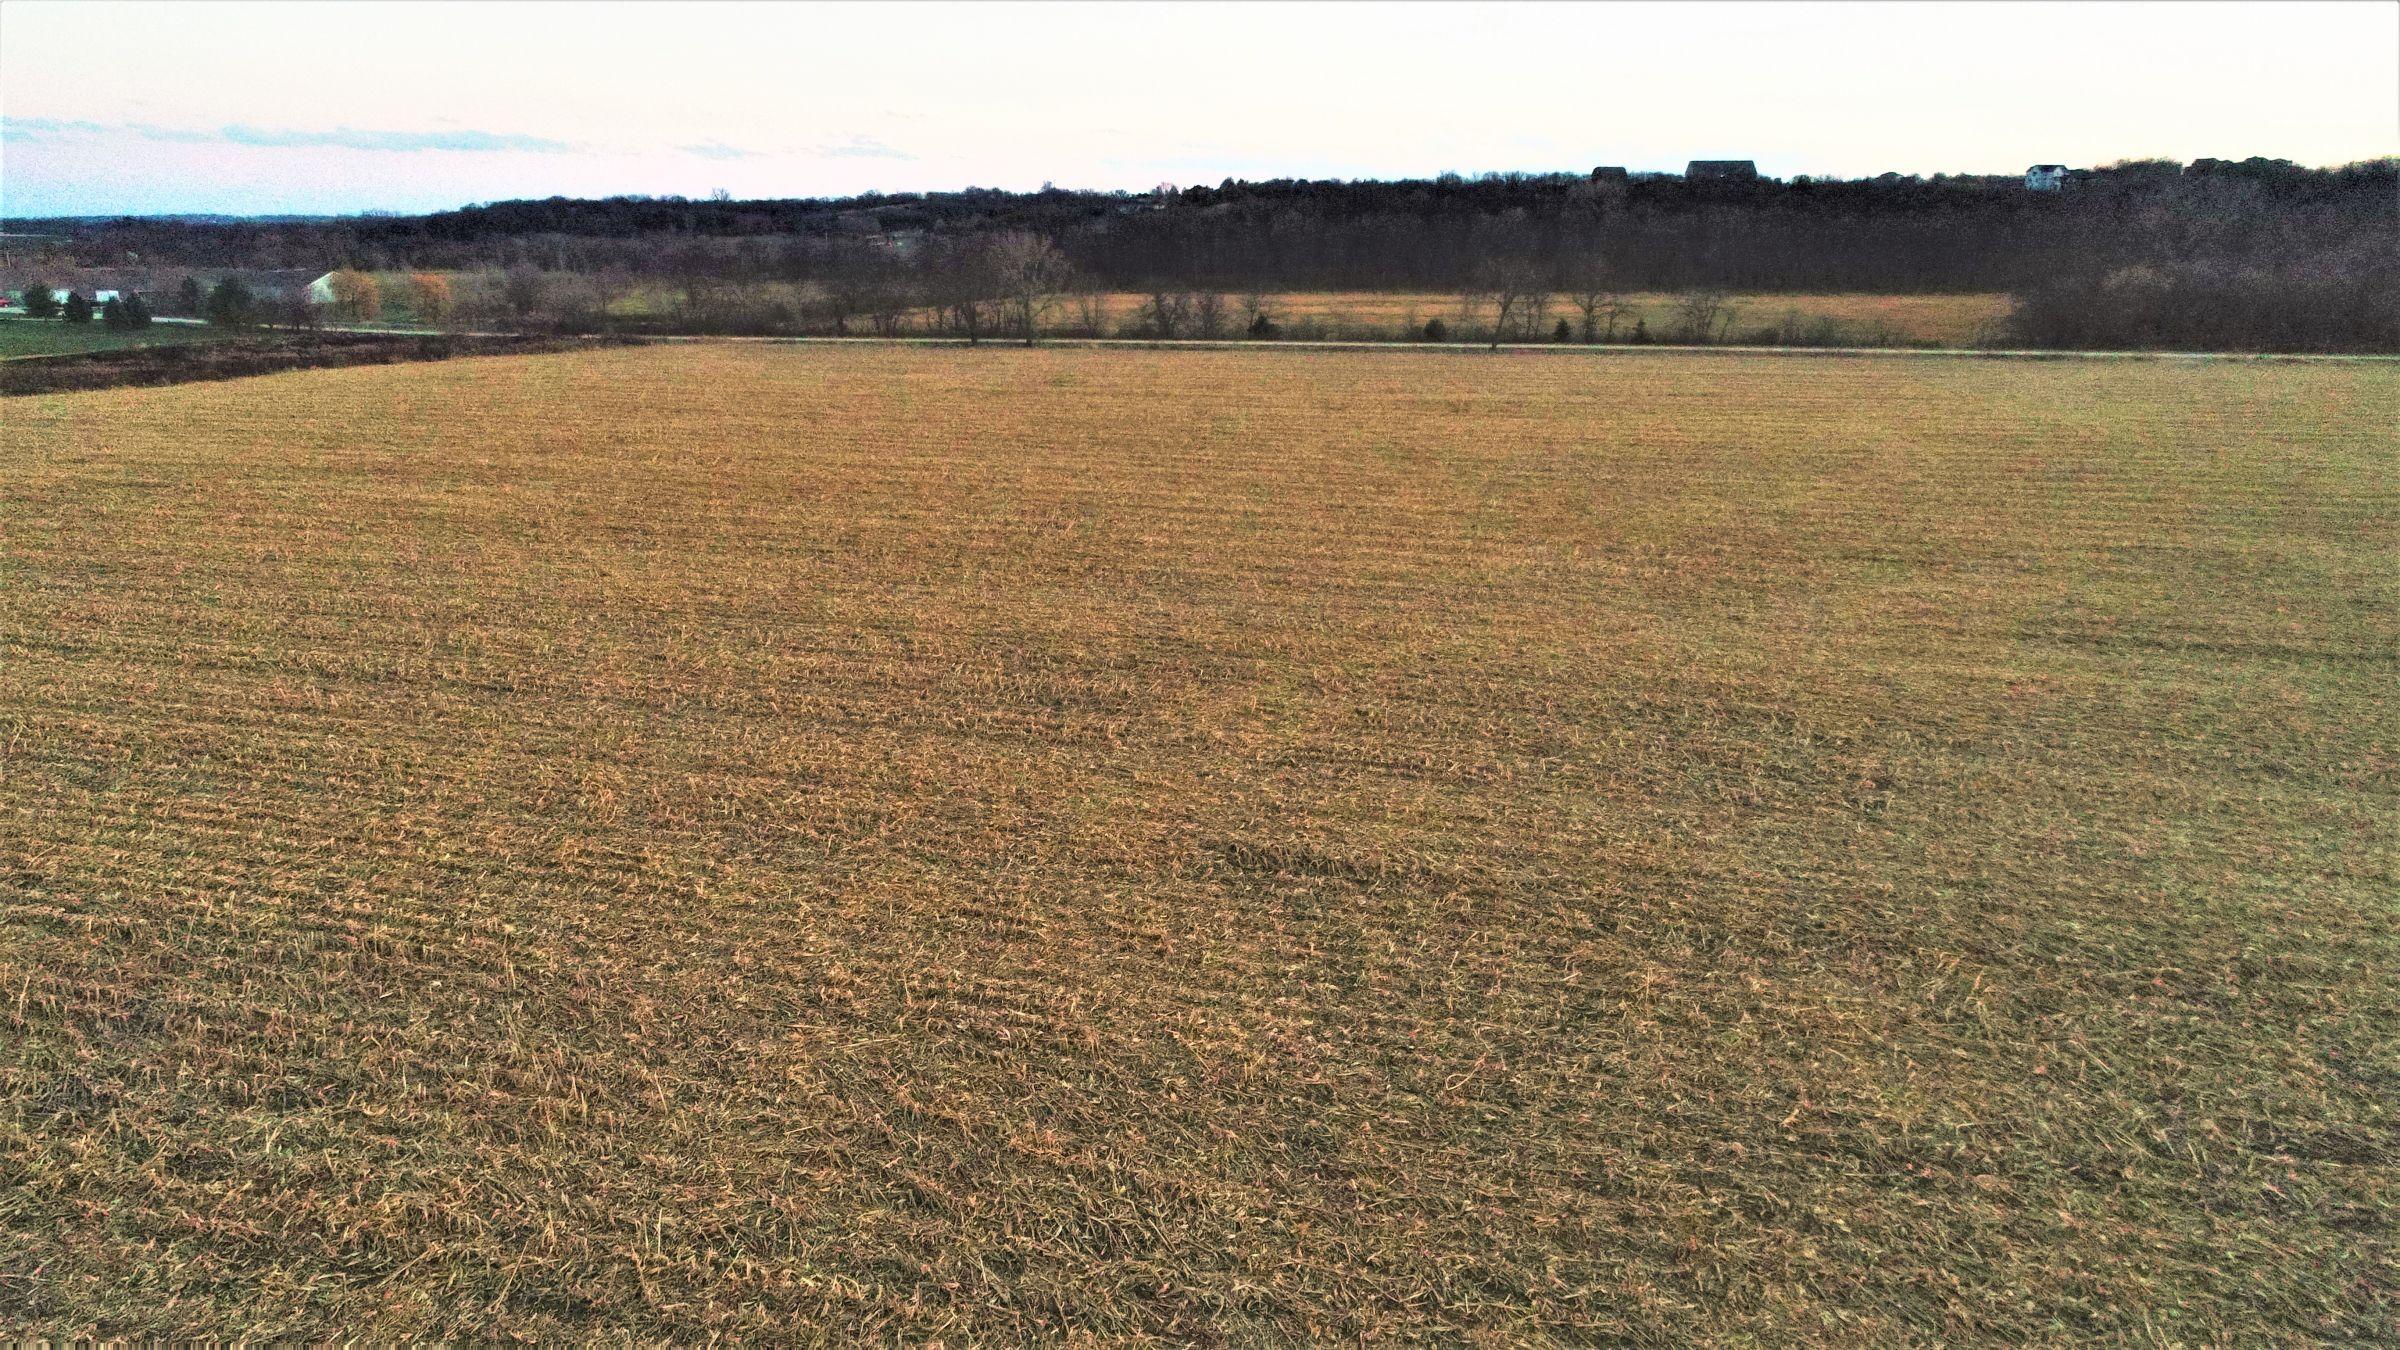 land-madison-county-iowa-20-acres-listing-number-15233-8-2020-11-10-001032.JPG